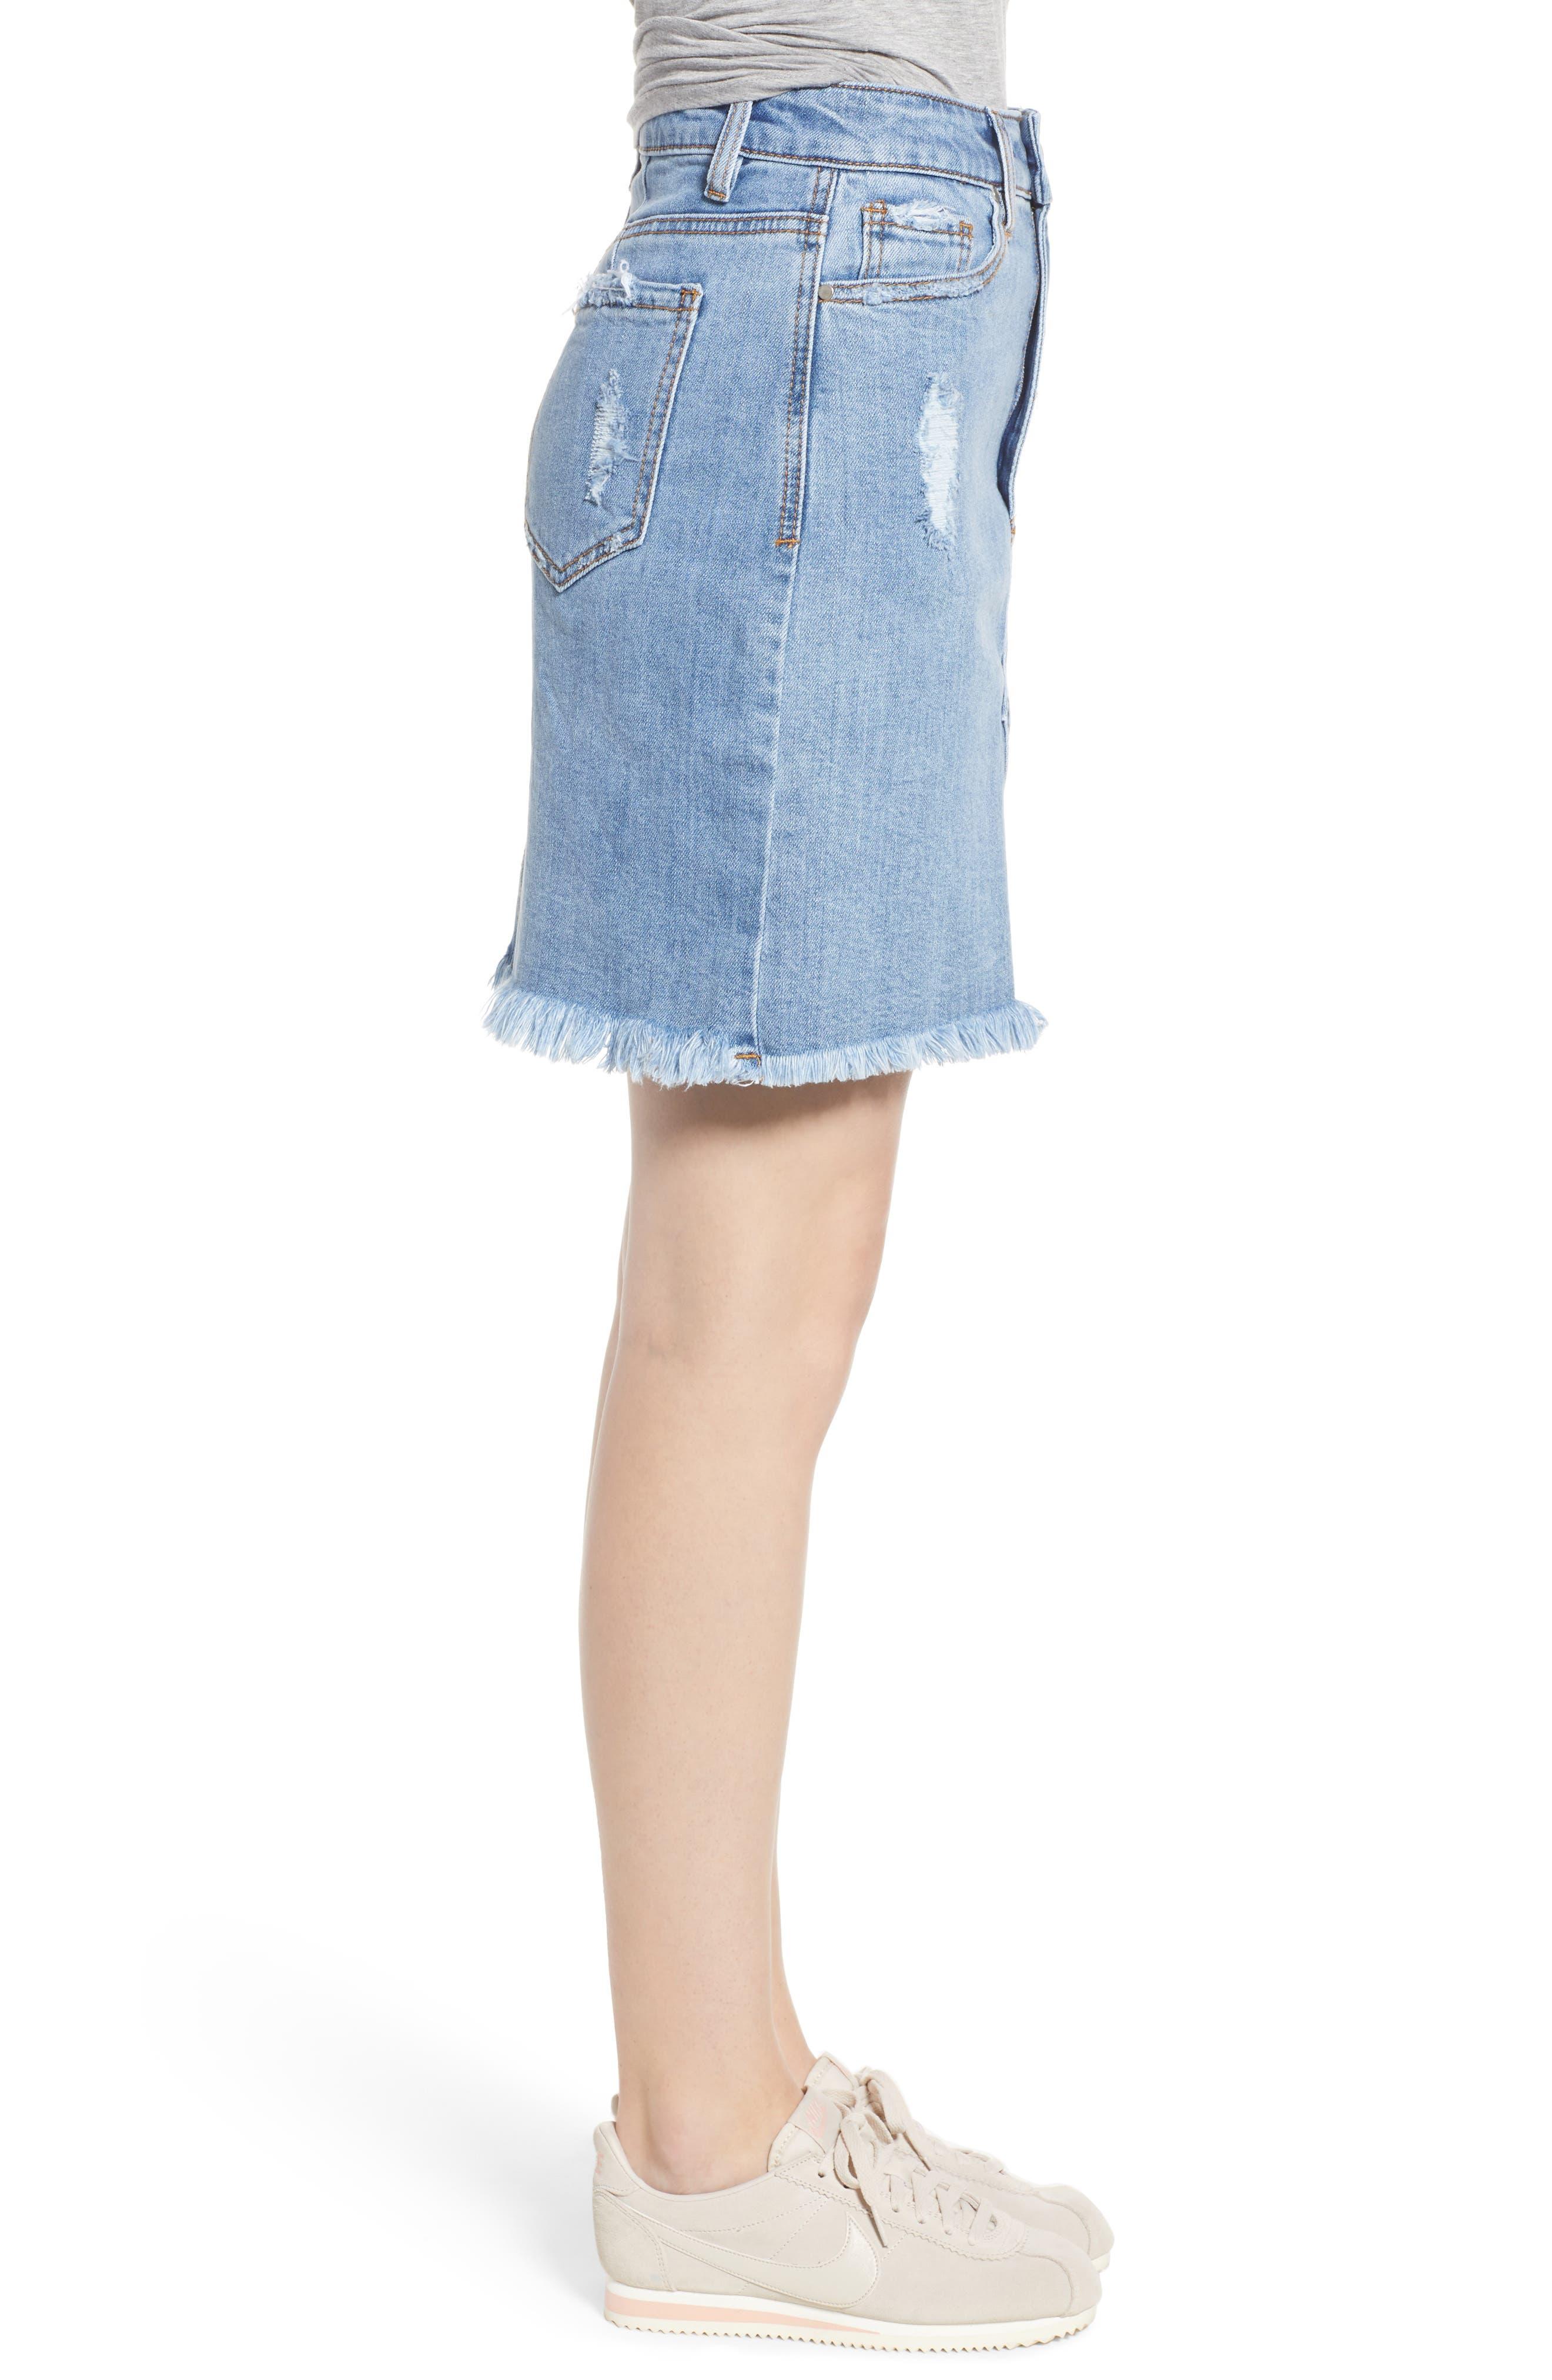 Distressed Denim Skirt,                             Alternate thumbnail 3, color,                             Light Wash